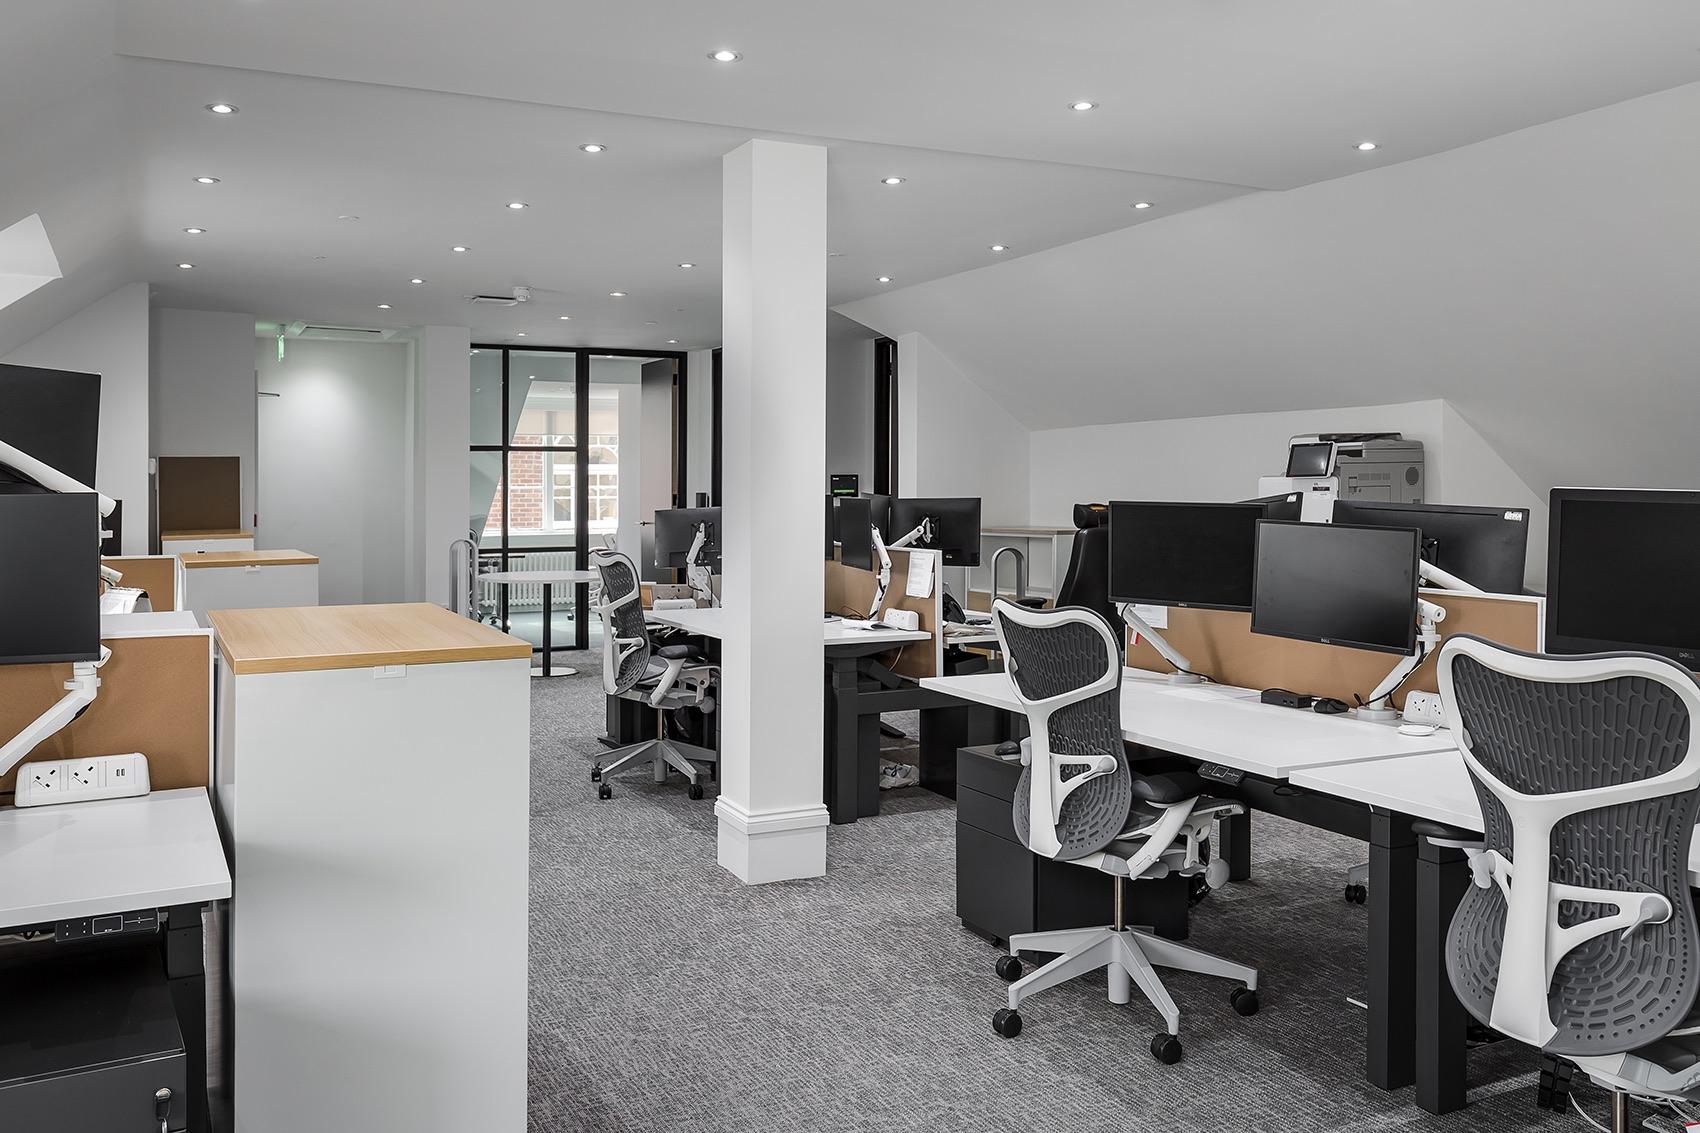 halma-amersham-office-30